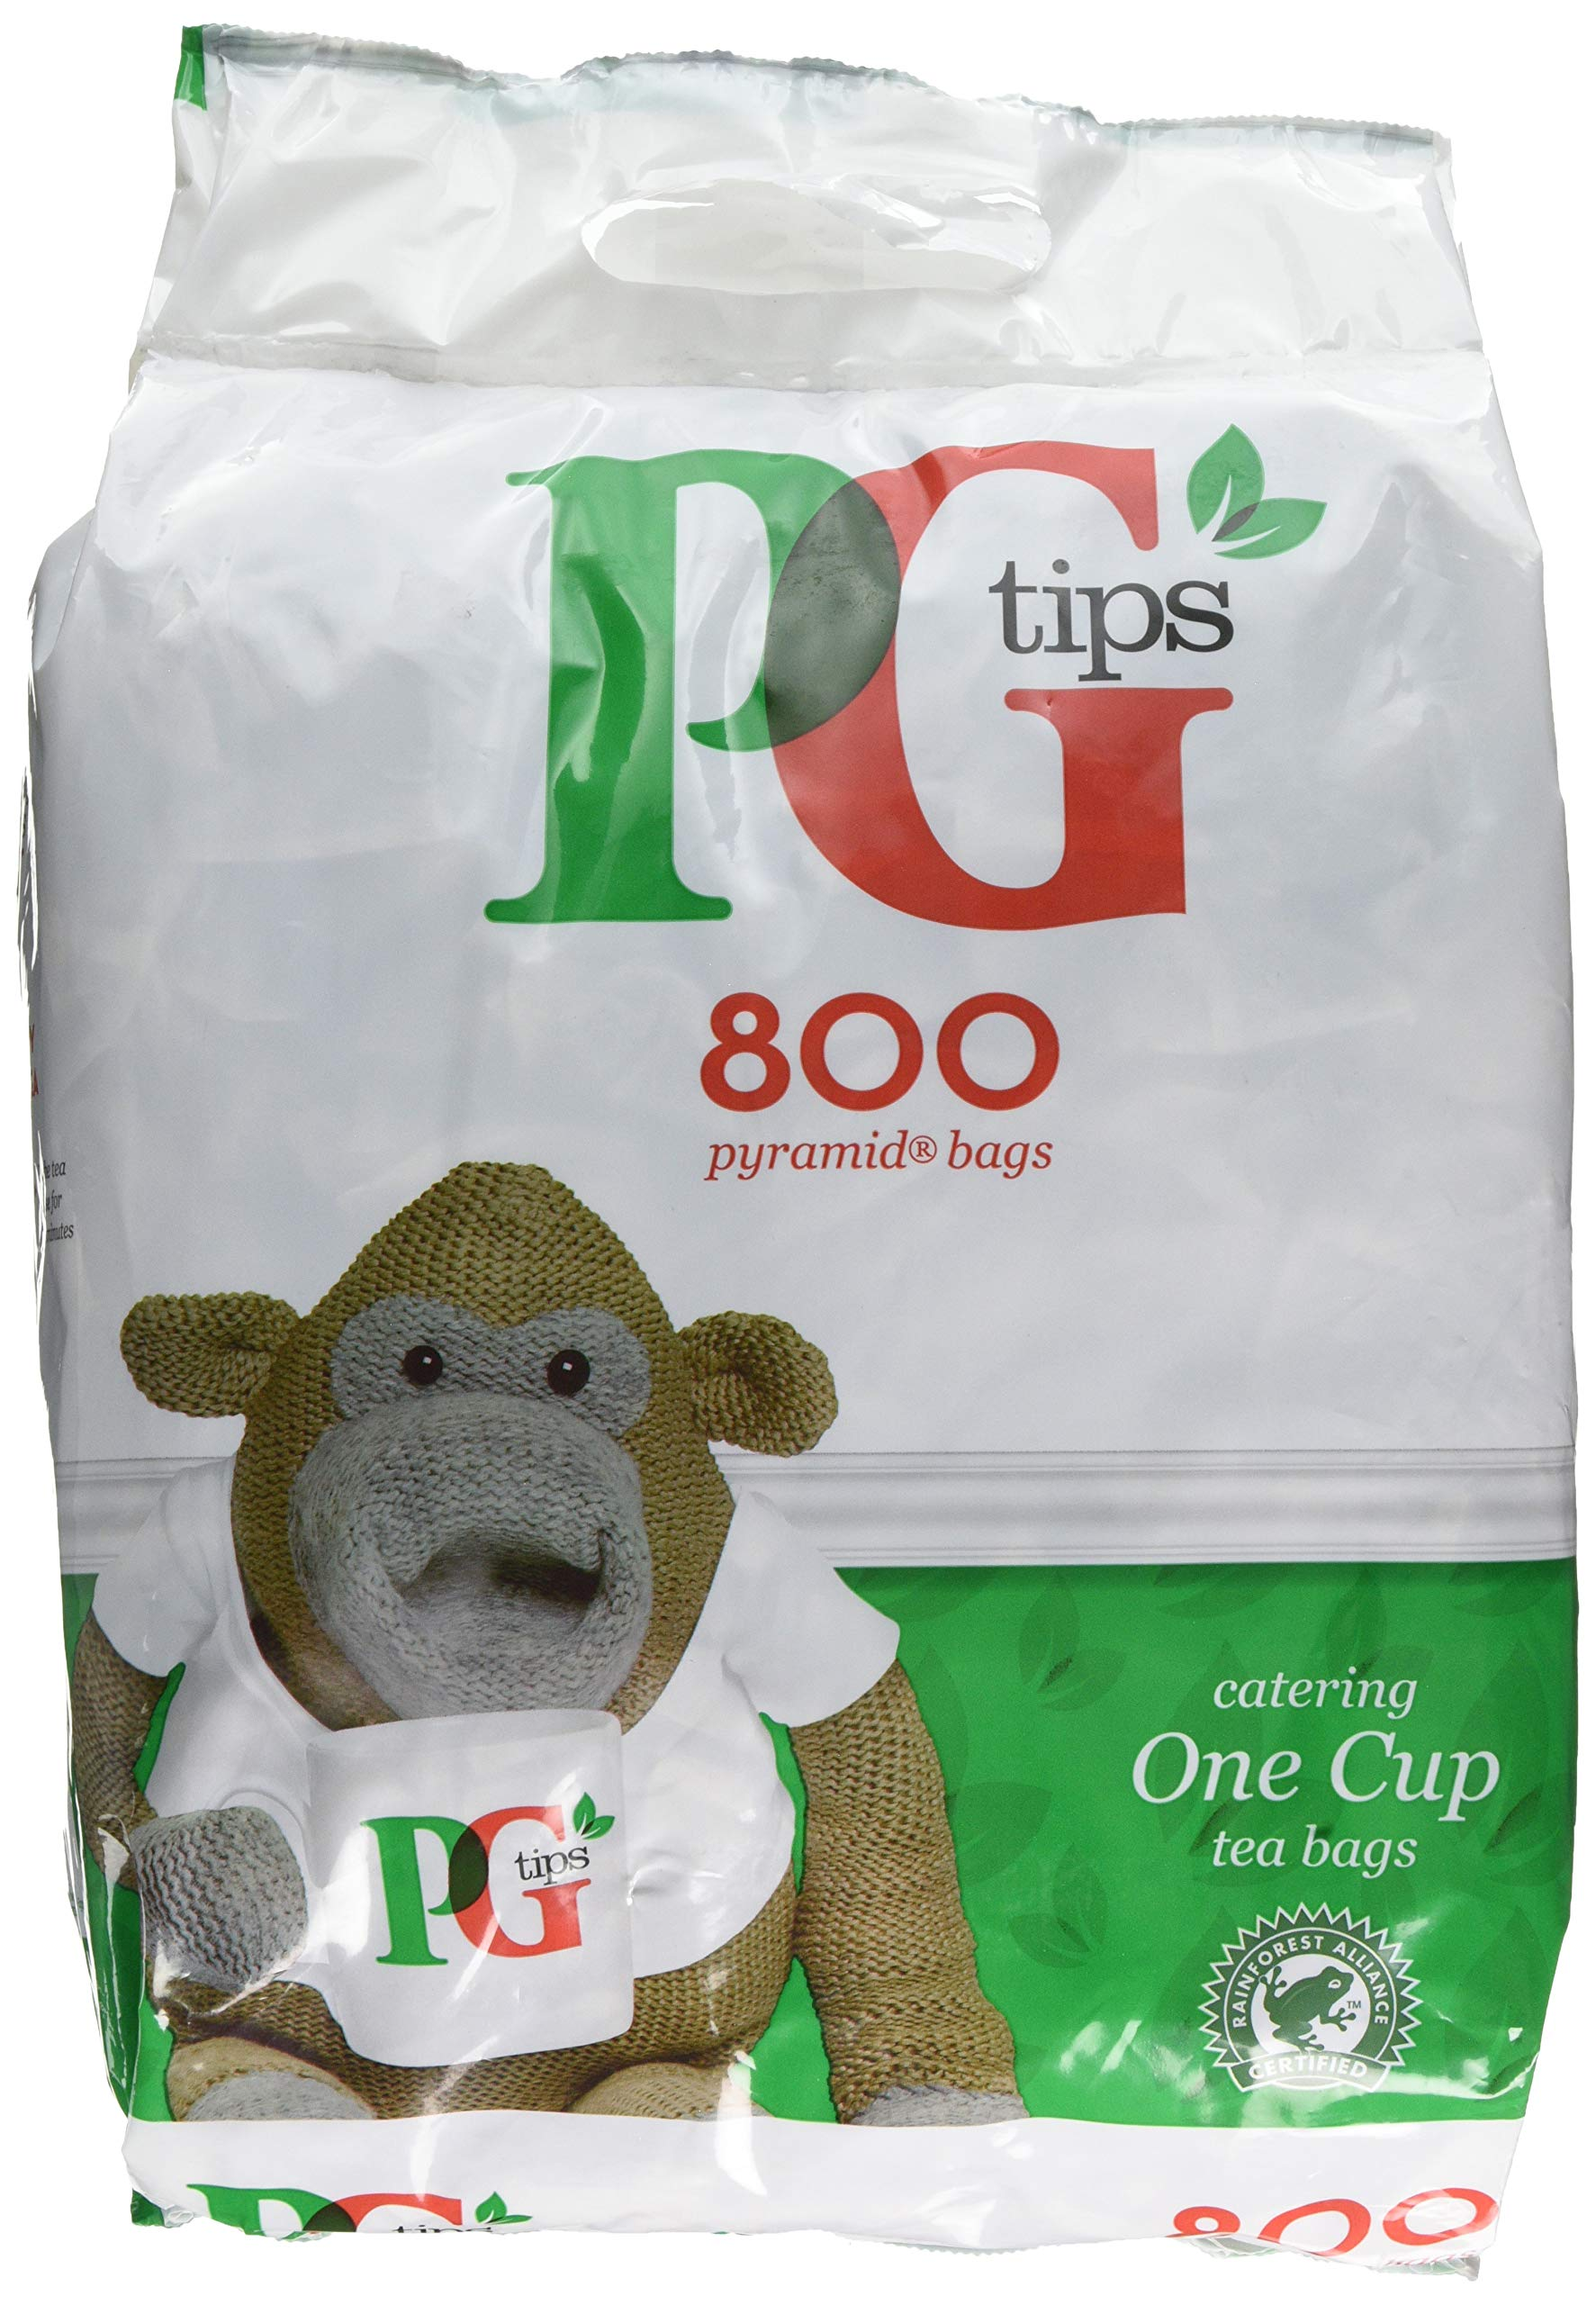 PG Tips one cup tea (rainforest alliance) (black tea) (800 bags) (brews in 1-3 minutes)